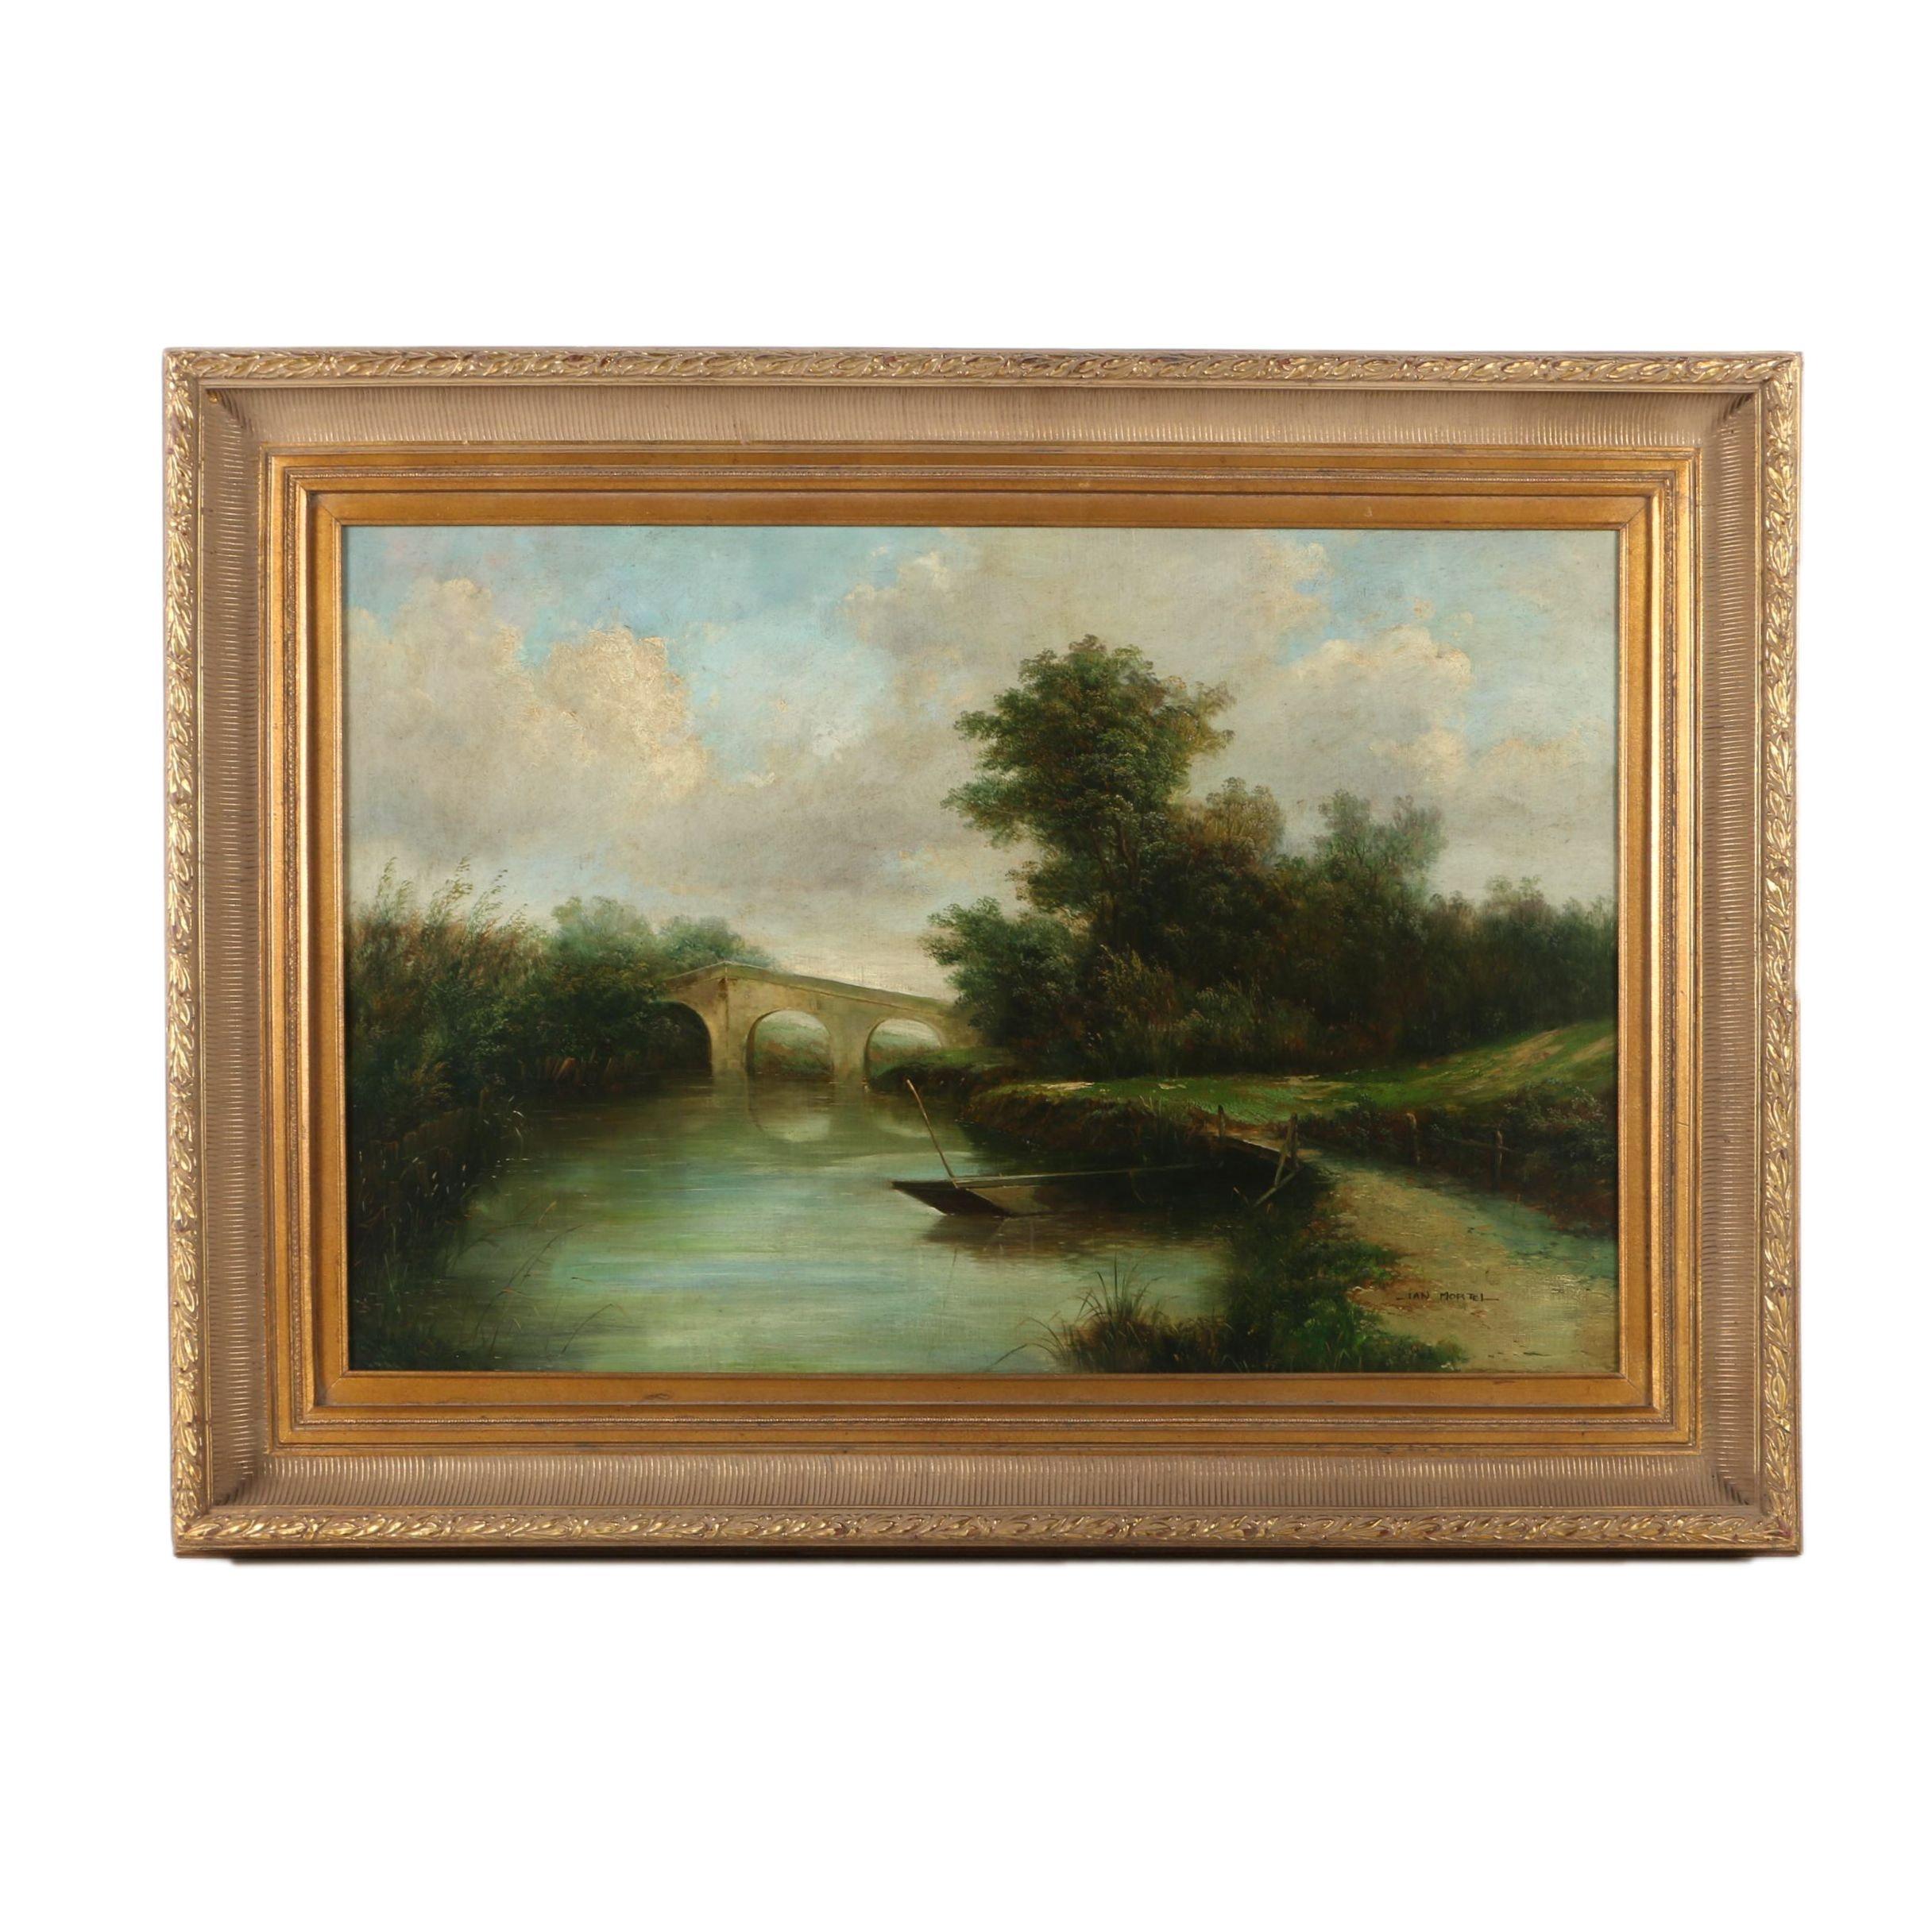 Jan Mortel Oil Painting on Canvas of a Landscape